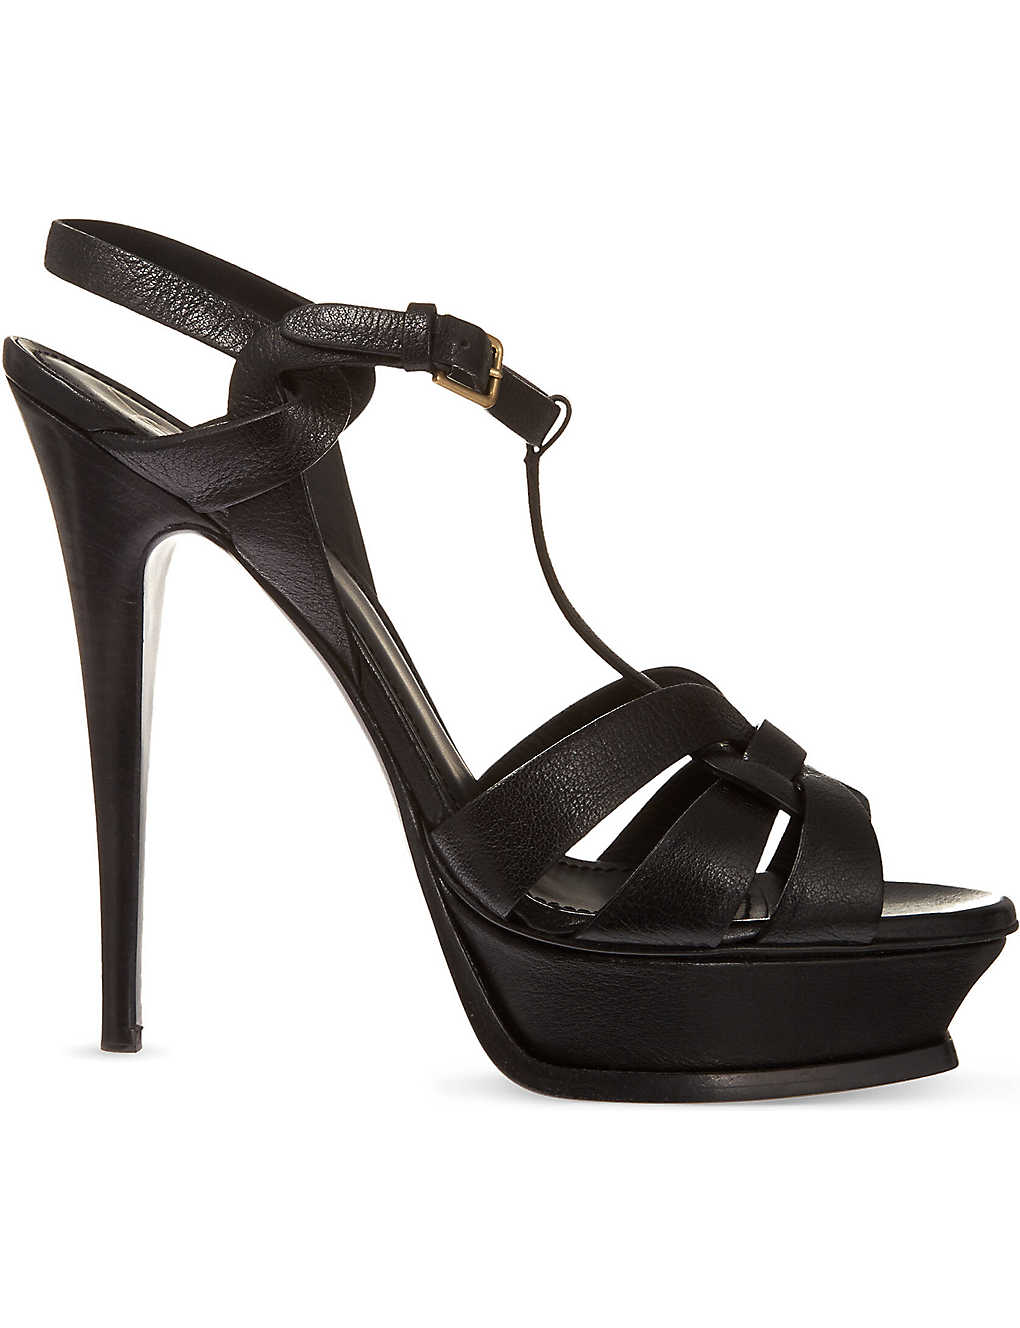 961167c04a6 SAINT LAURENT - Tribute 105 leather heeled sandals | Selfridges.com